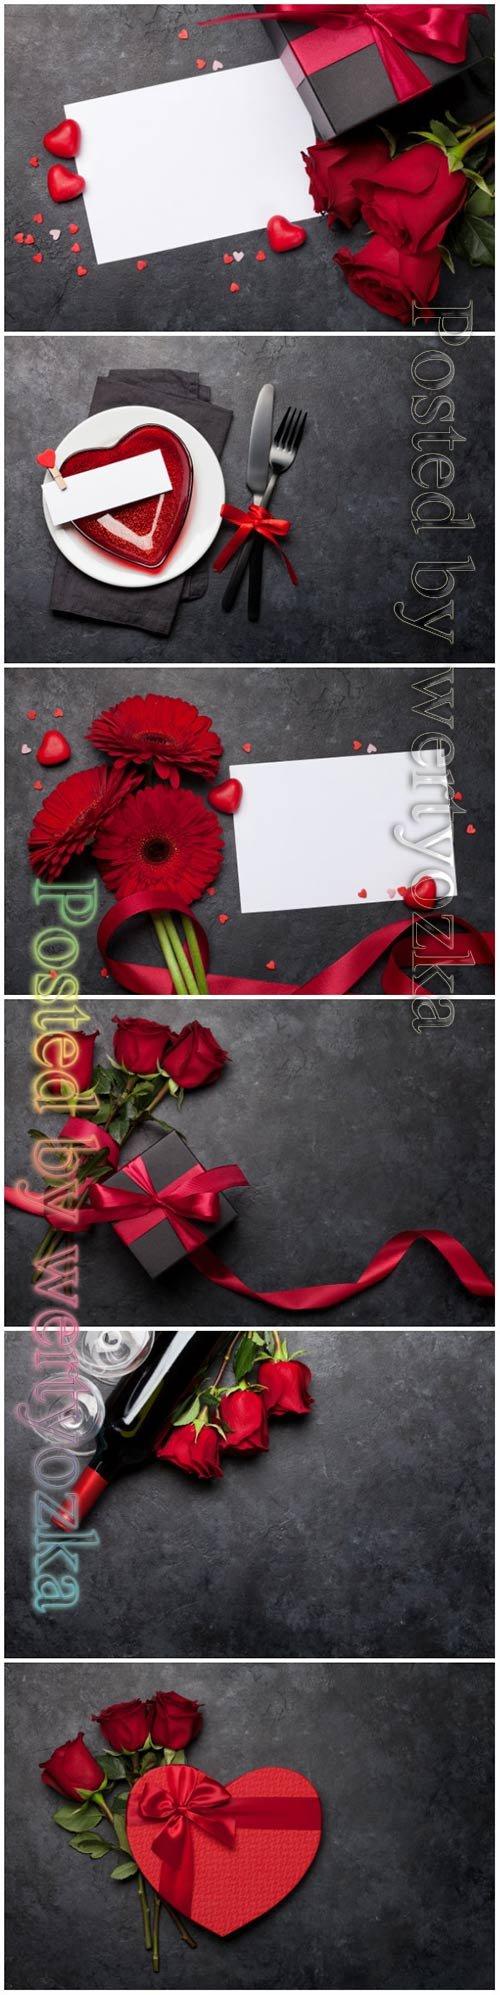 Valentines day beautiful stock photo # 4